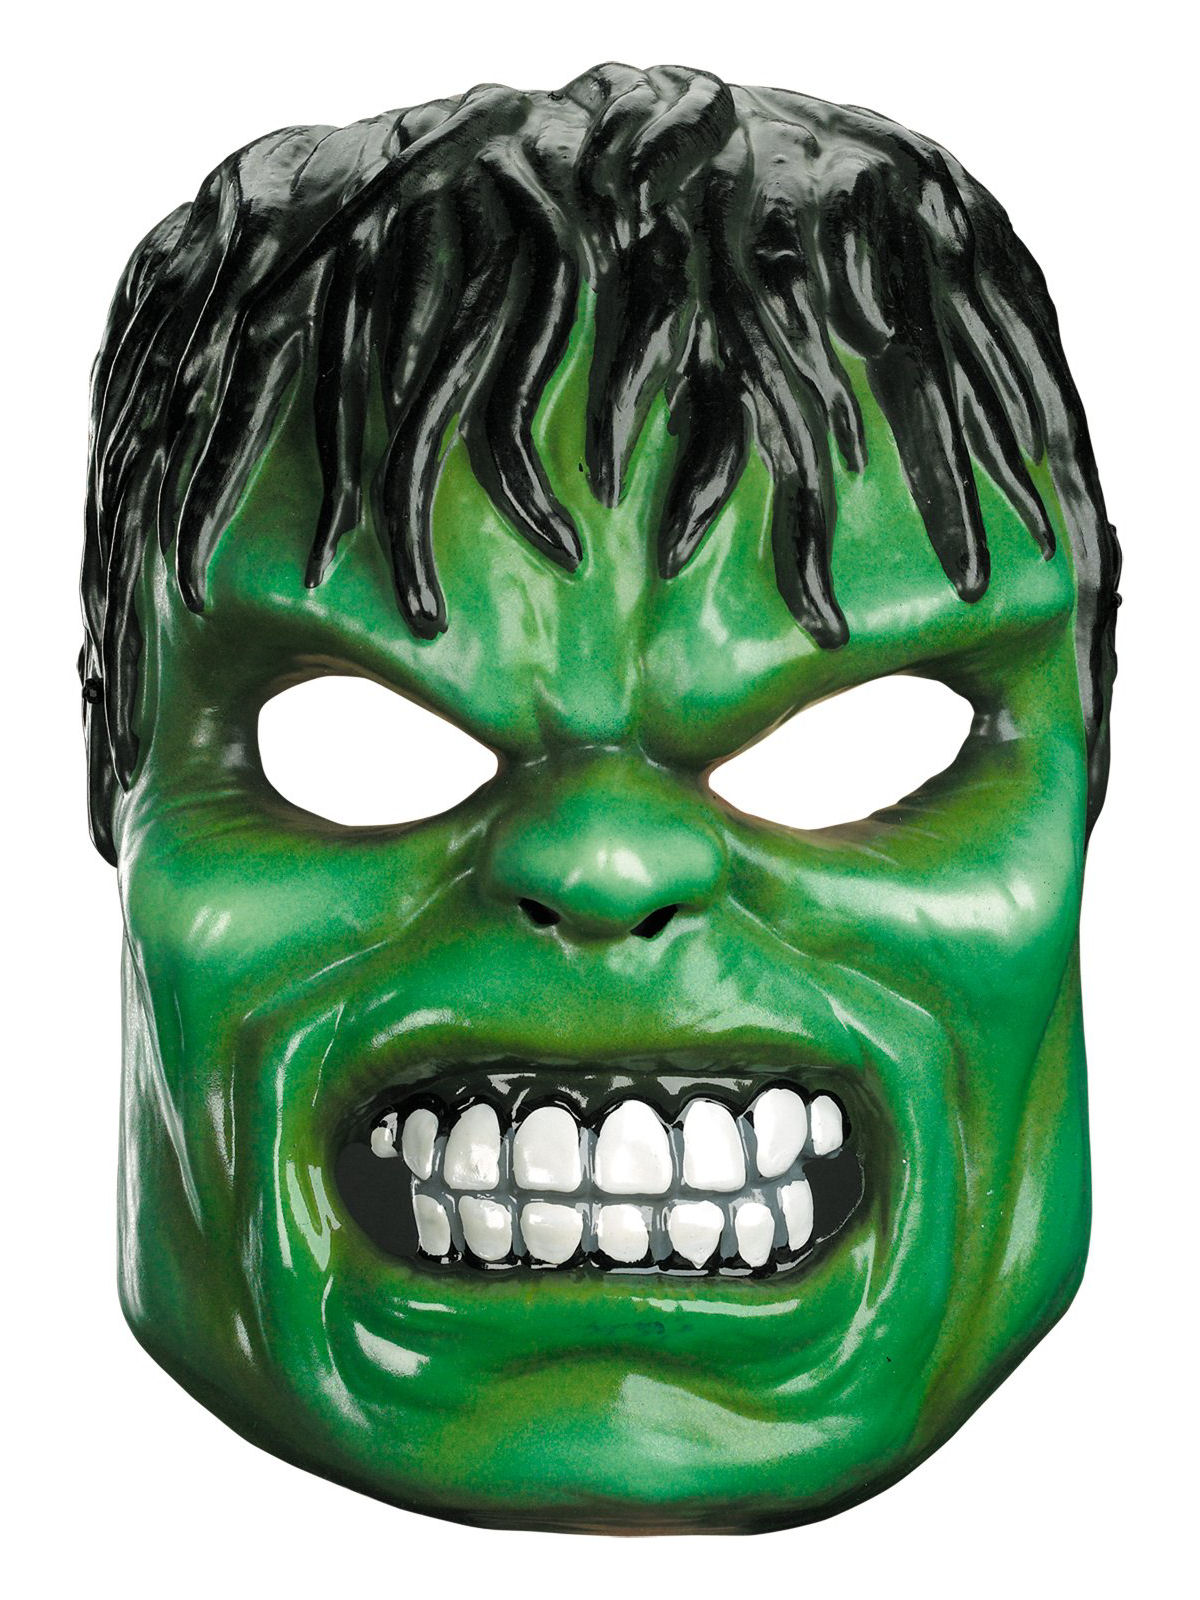 50 Mascaras Coloridas Para Imprimir E Fazer Fantasia De Carnaval